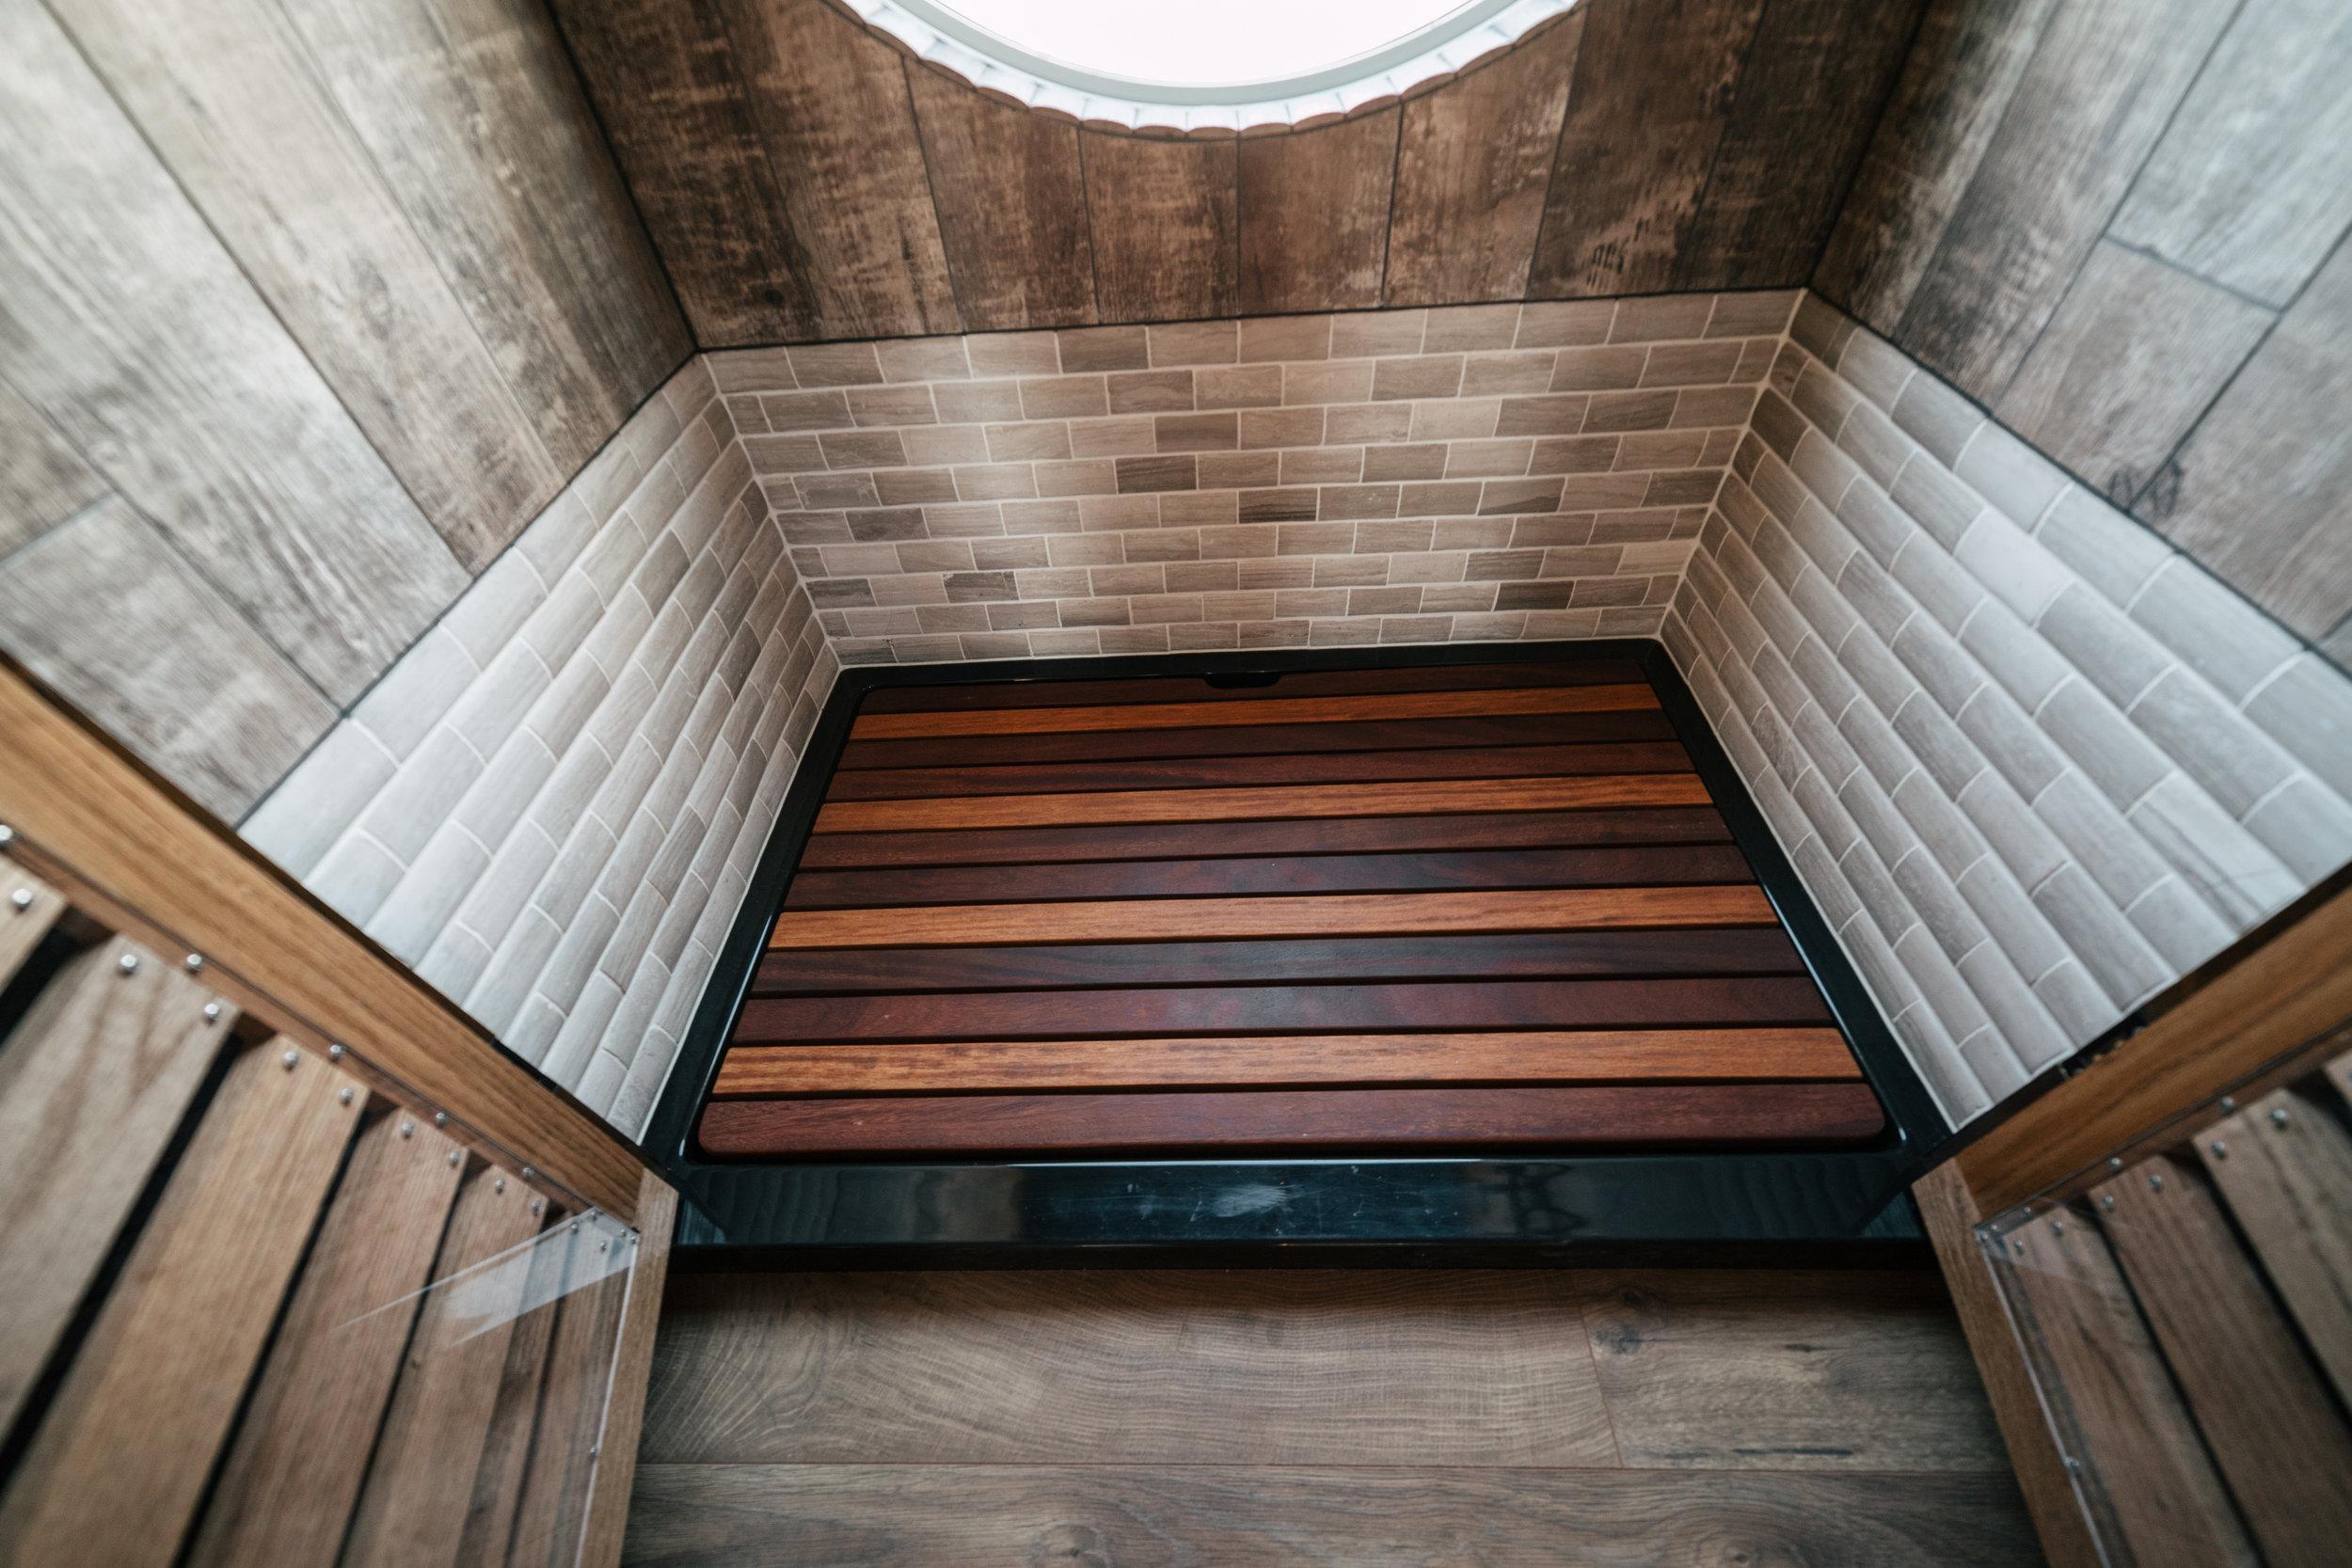 The Silhouette by Wind River Tiny Homes -oak wood slat/Plexiglass shower stall doors, limestone tile, faux wood tile, cumaru wood shower deck insert